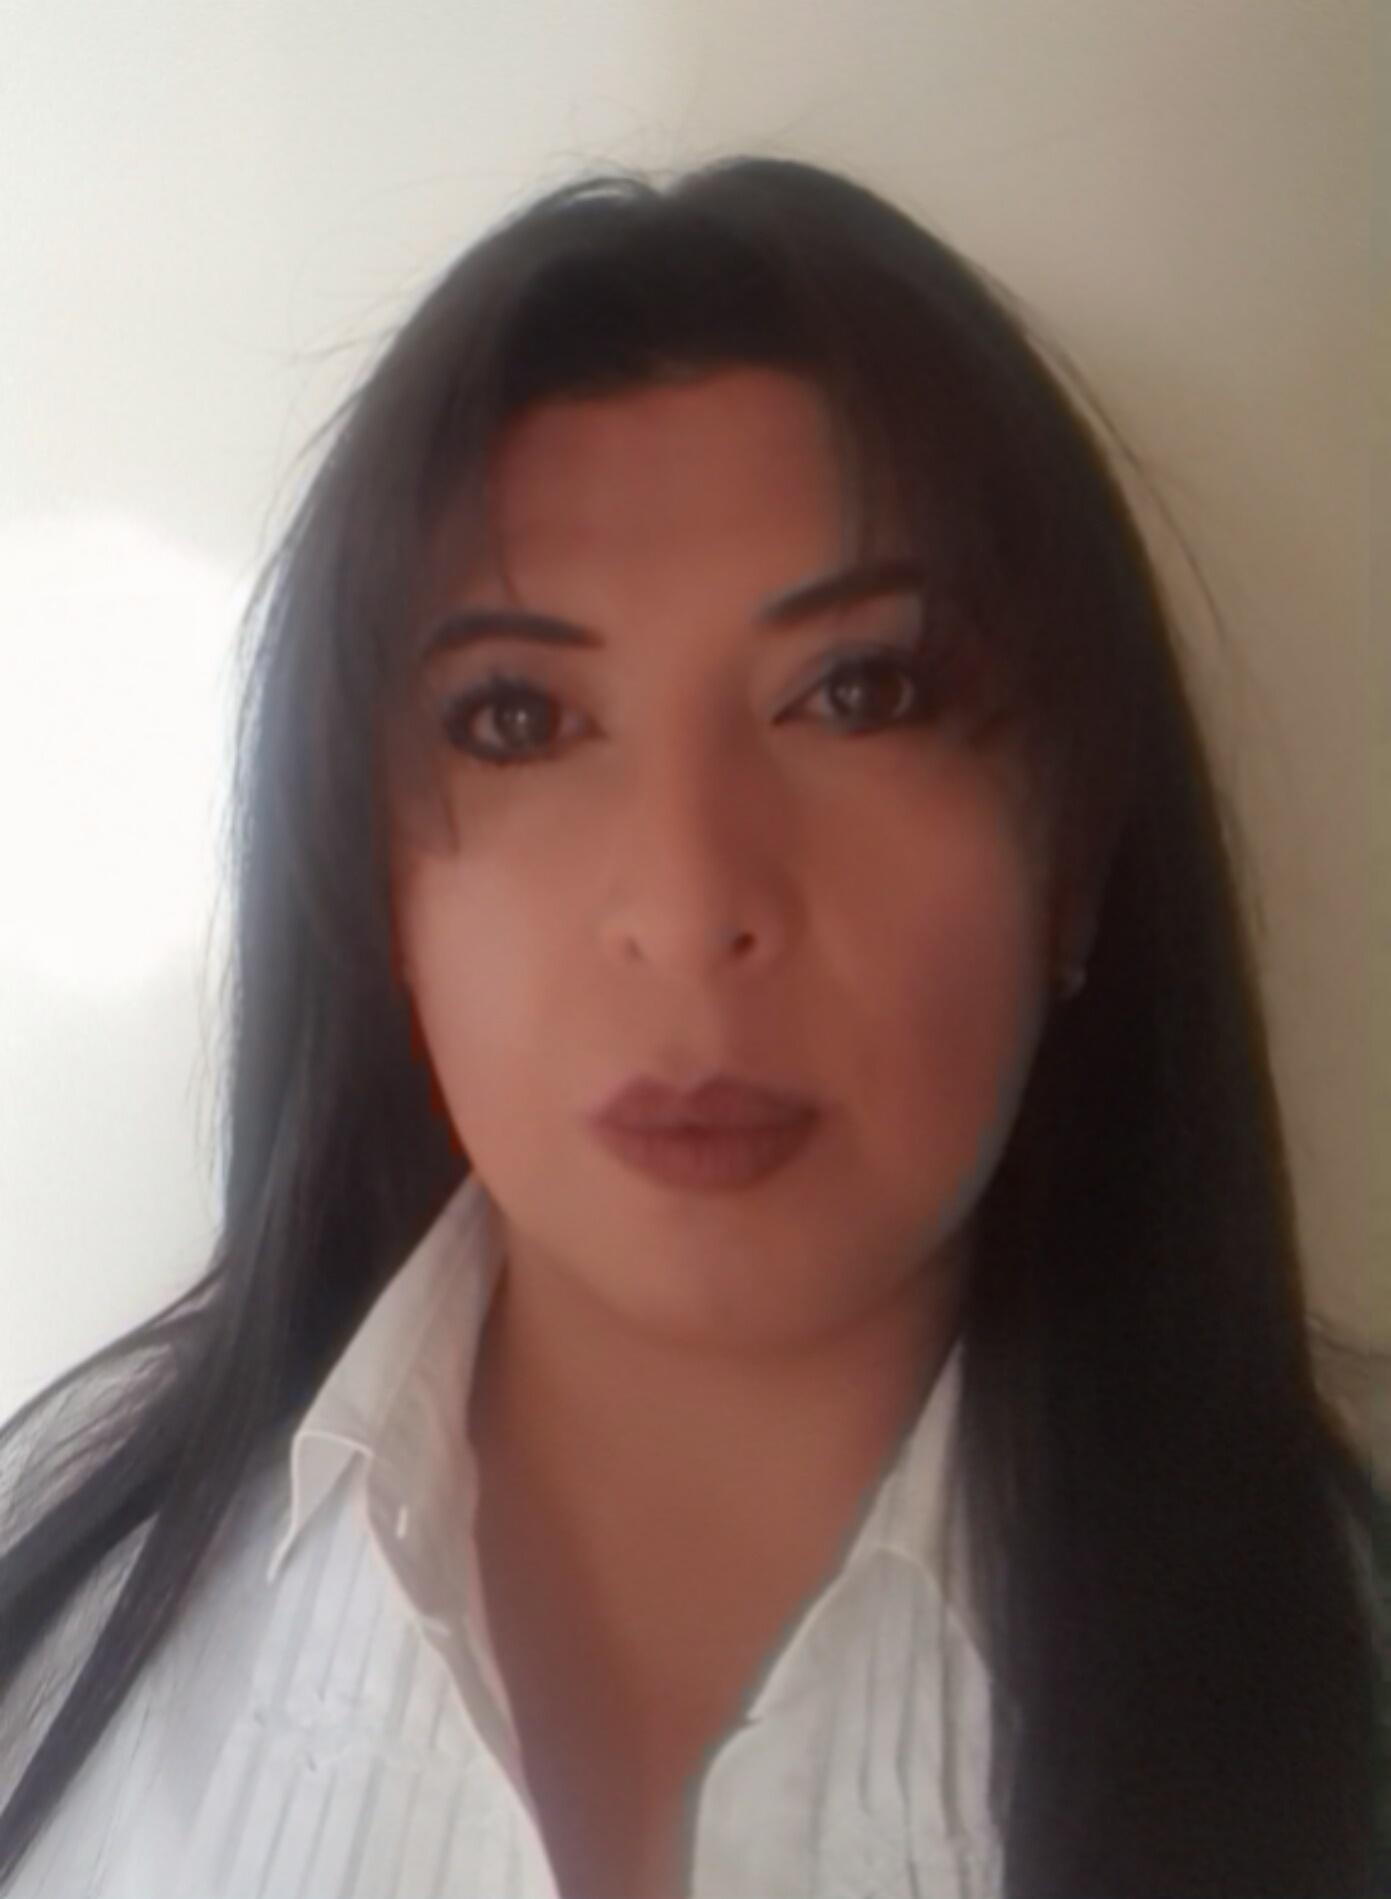 Lic. Celia Janeth López Chimal